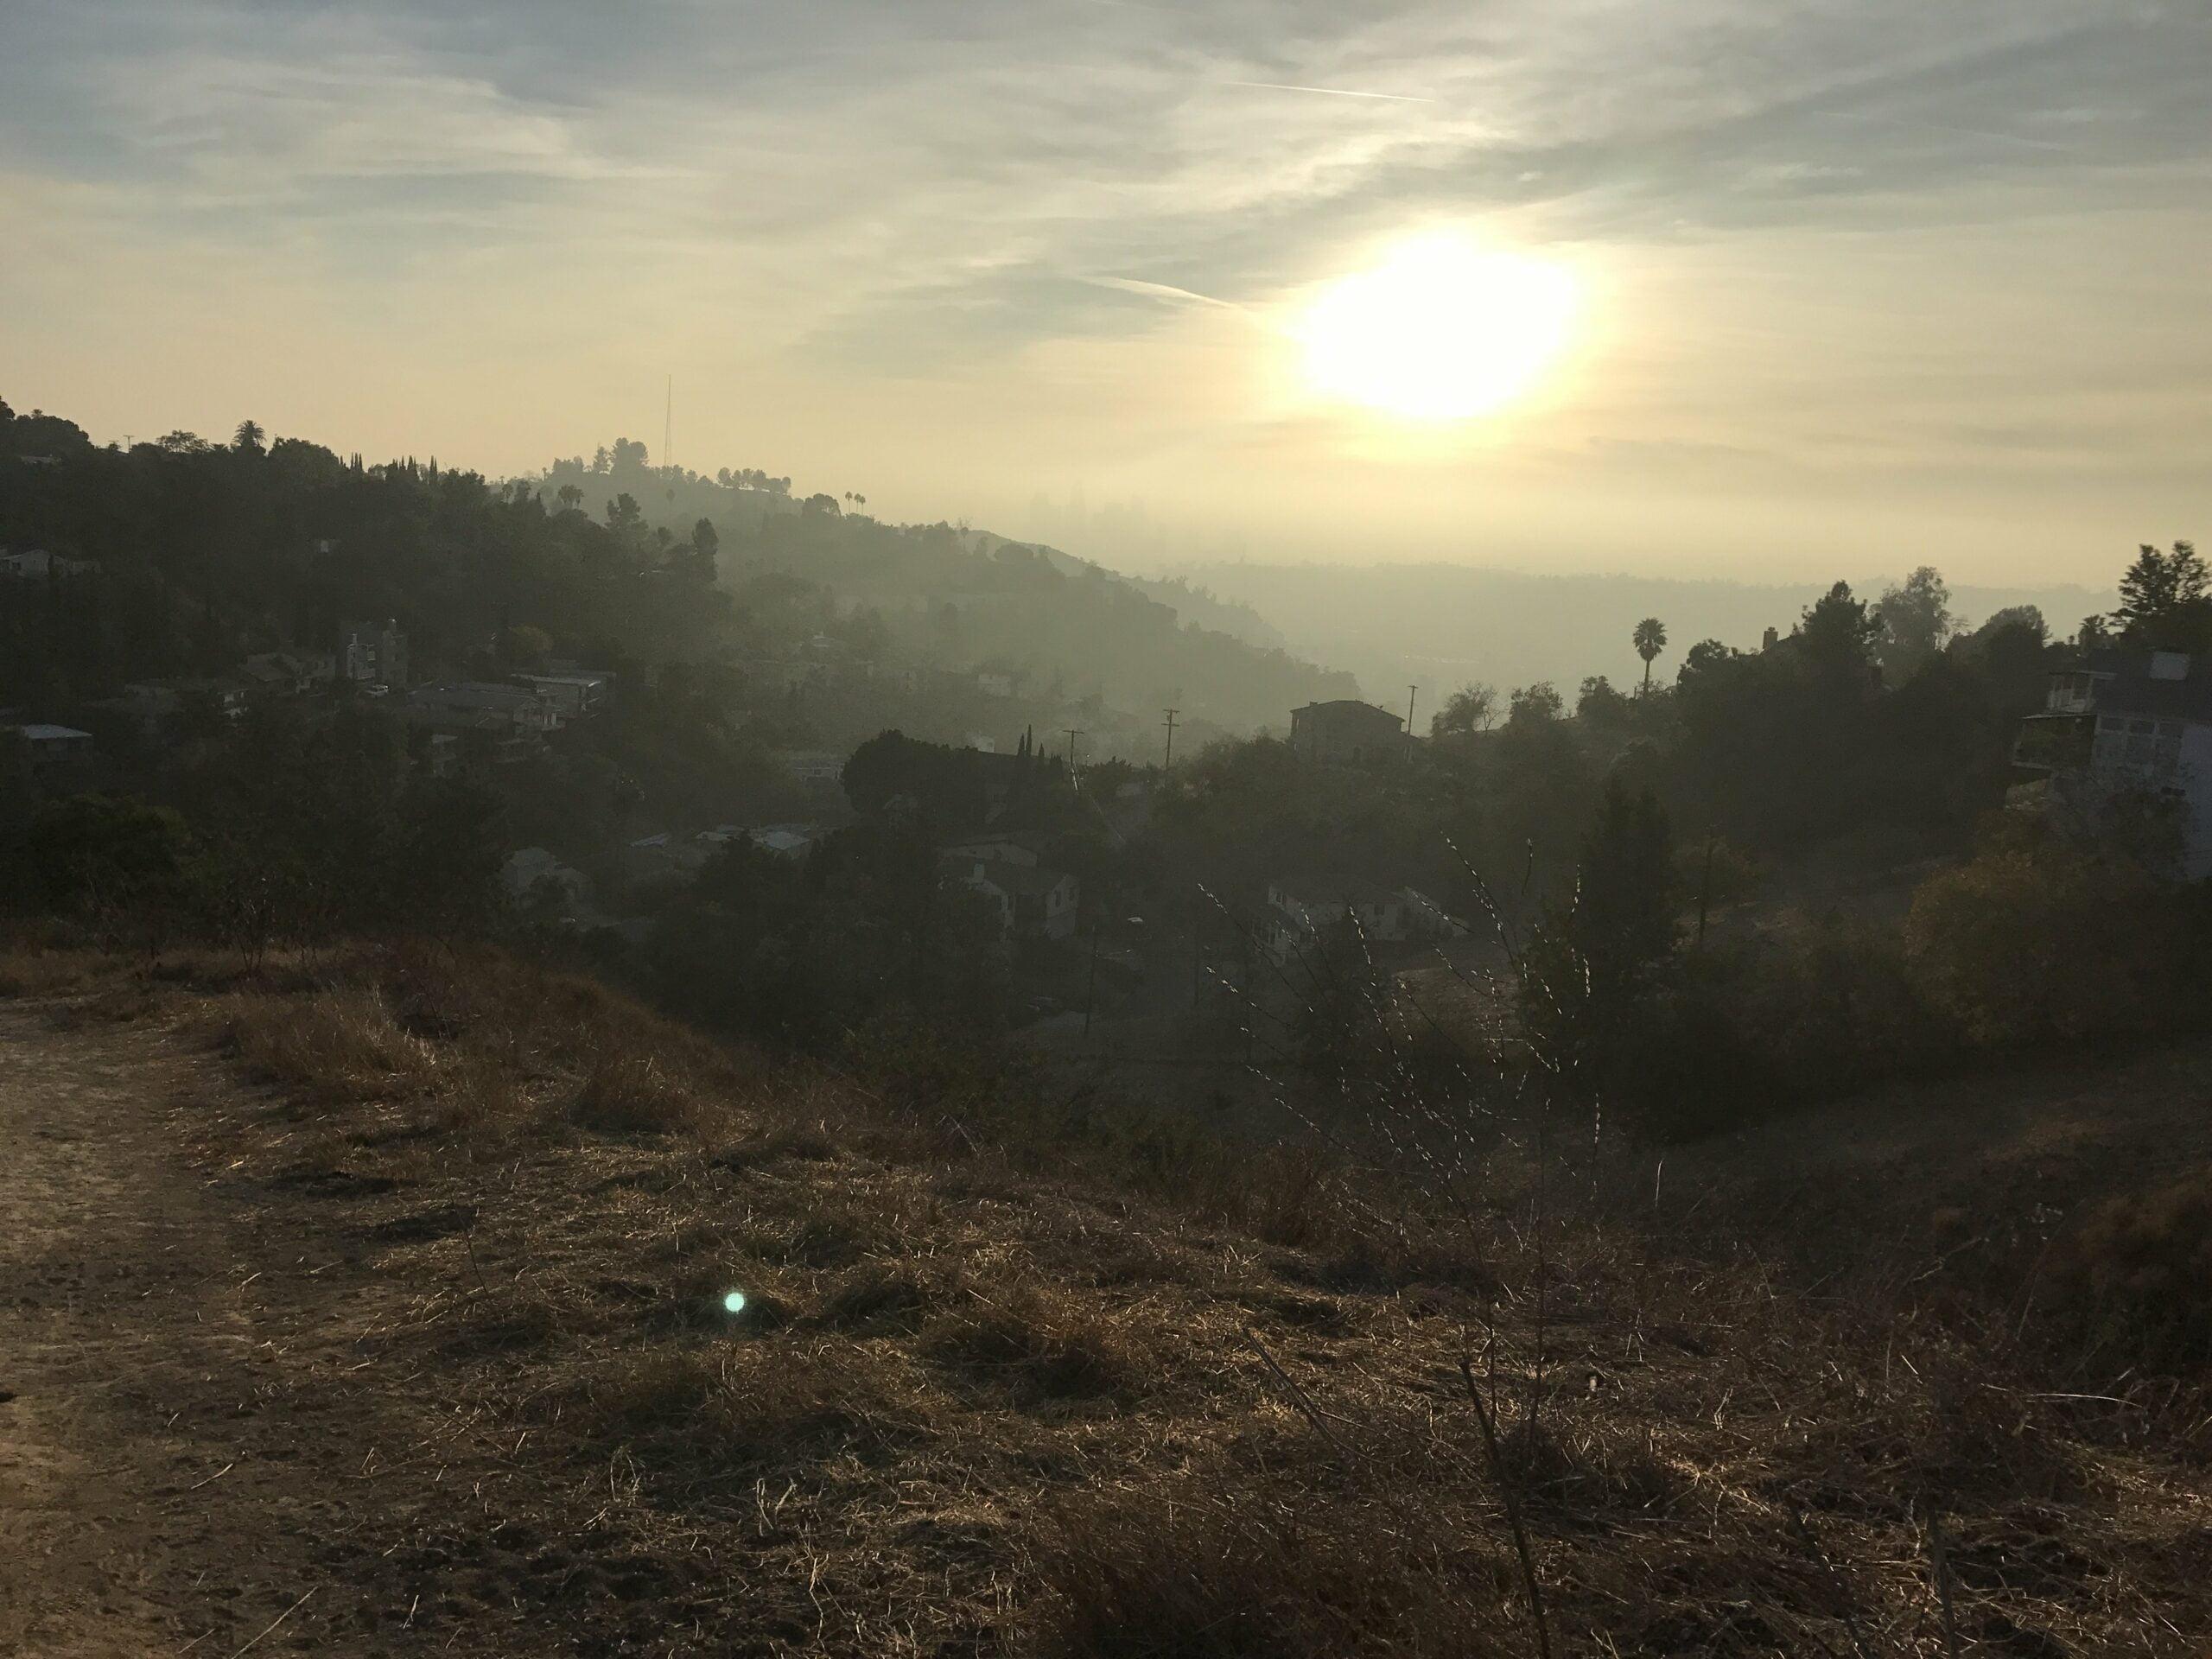 ernest e debs regional park sunset view